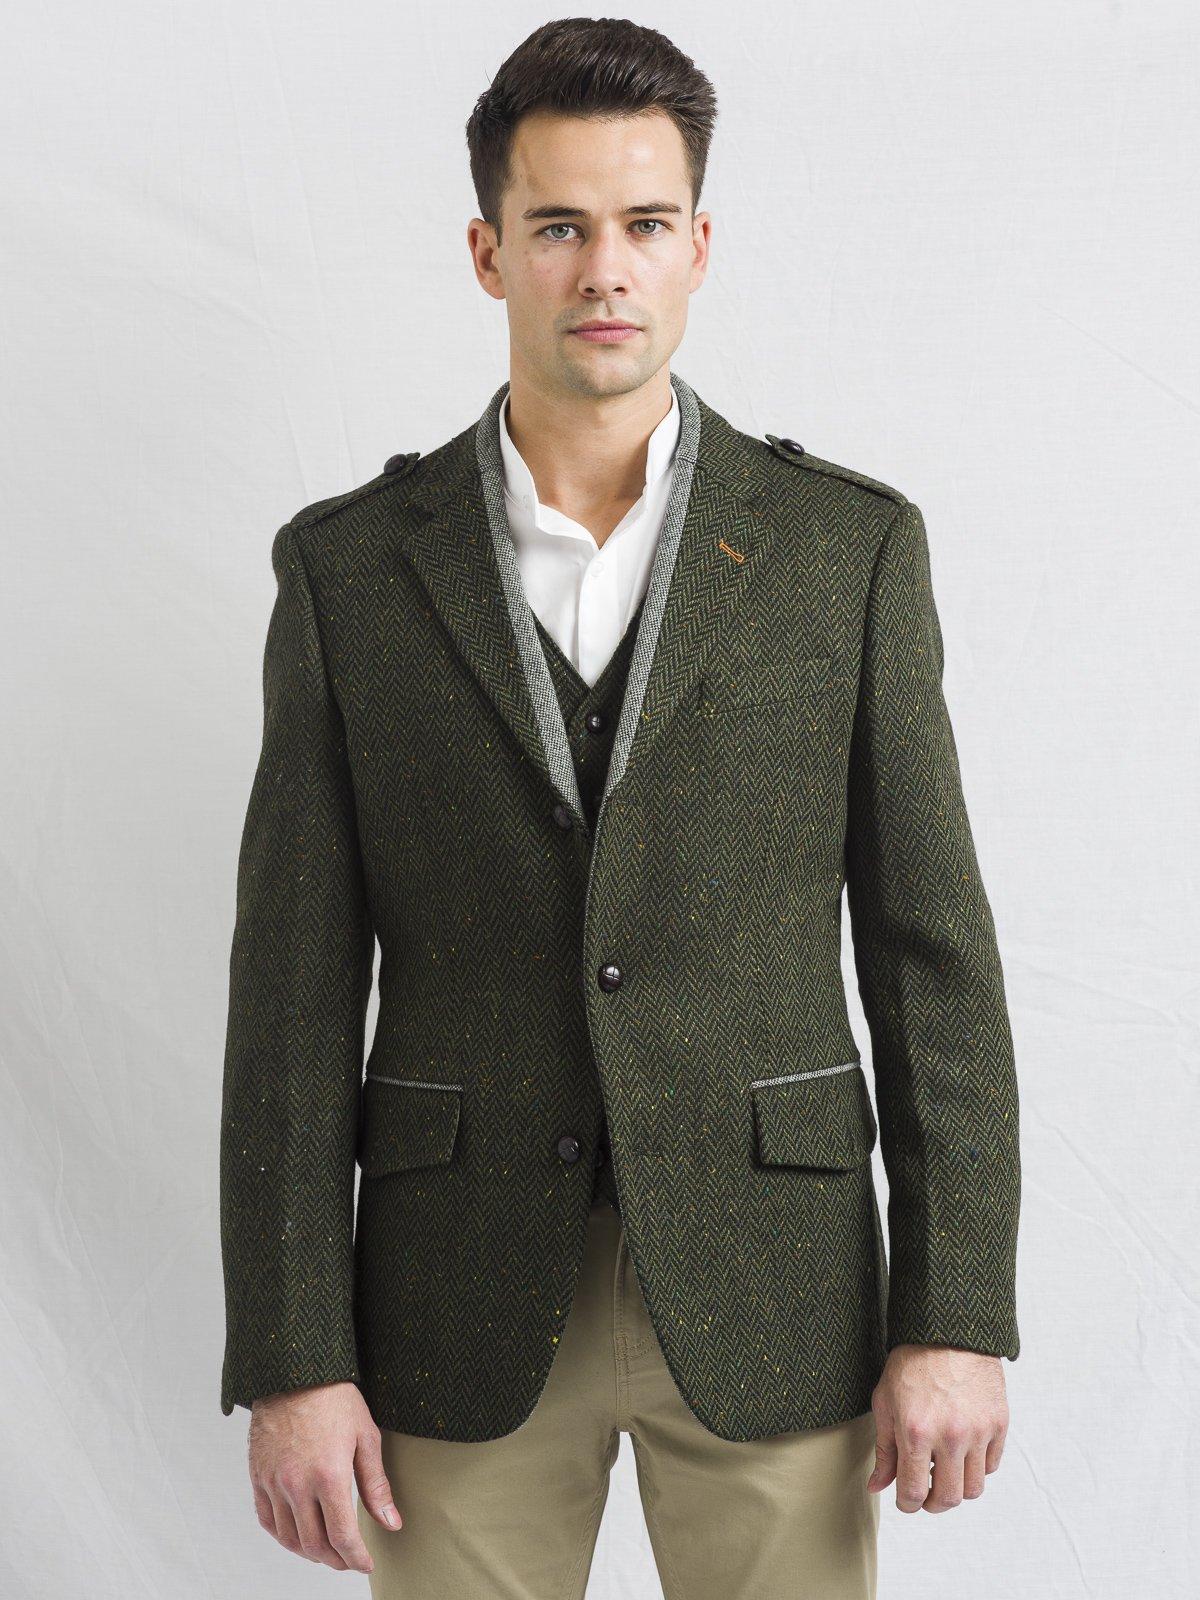 Green Tweed Three Piece Suit